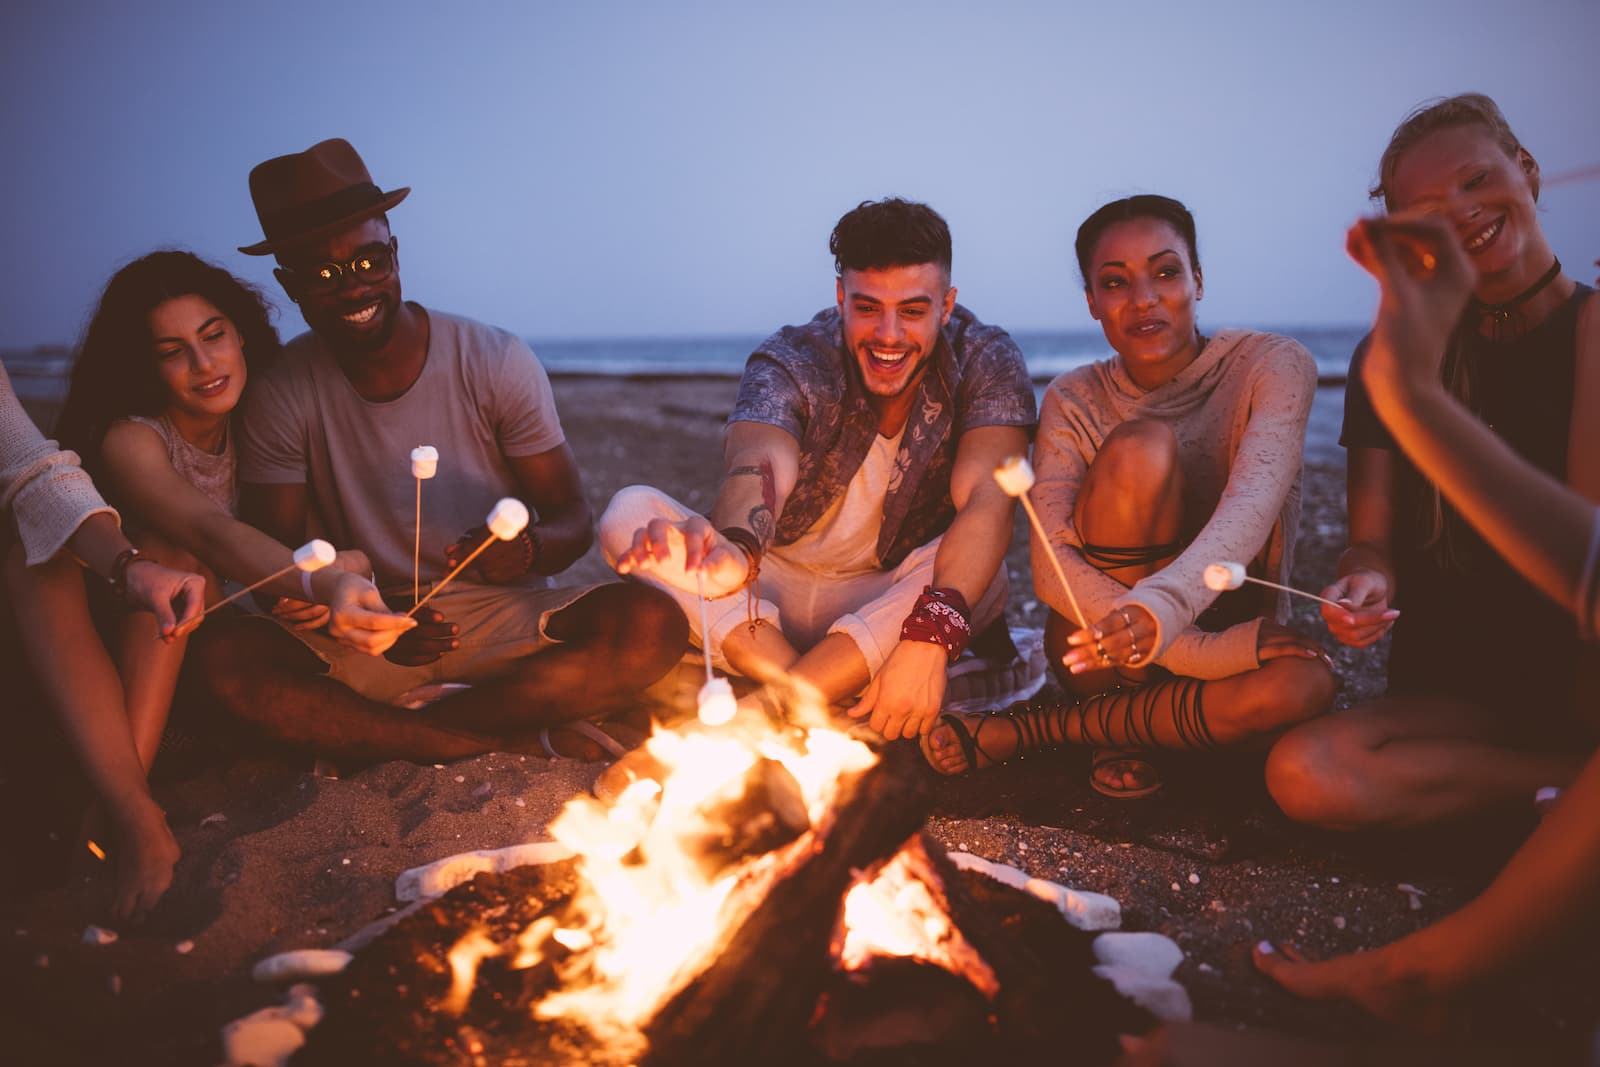 friends at a bonfire roasting marshmallows